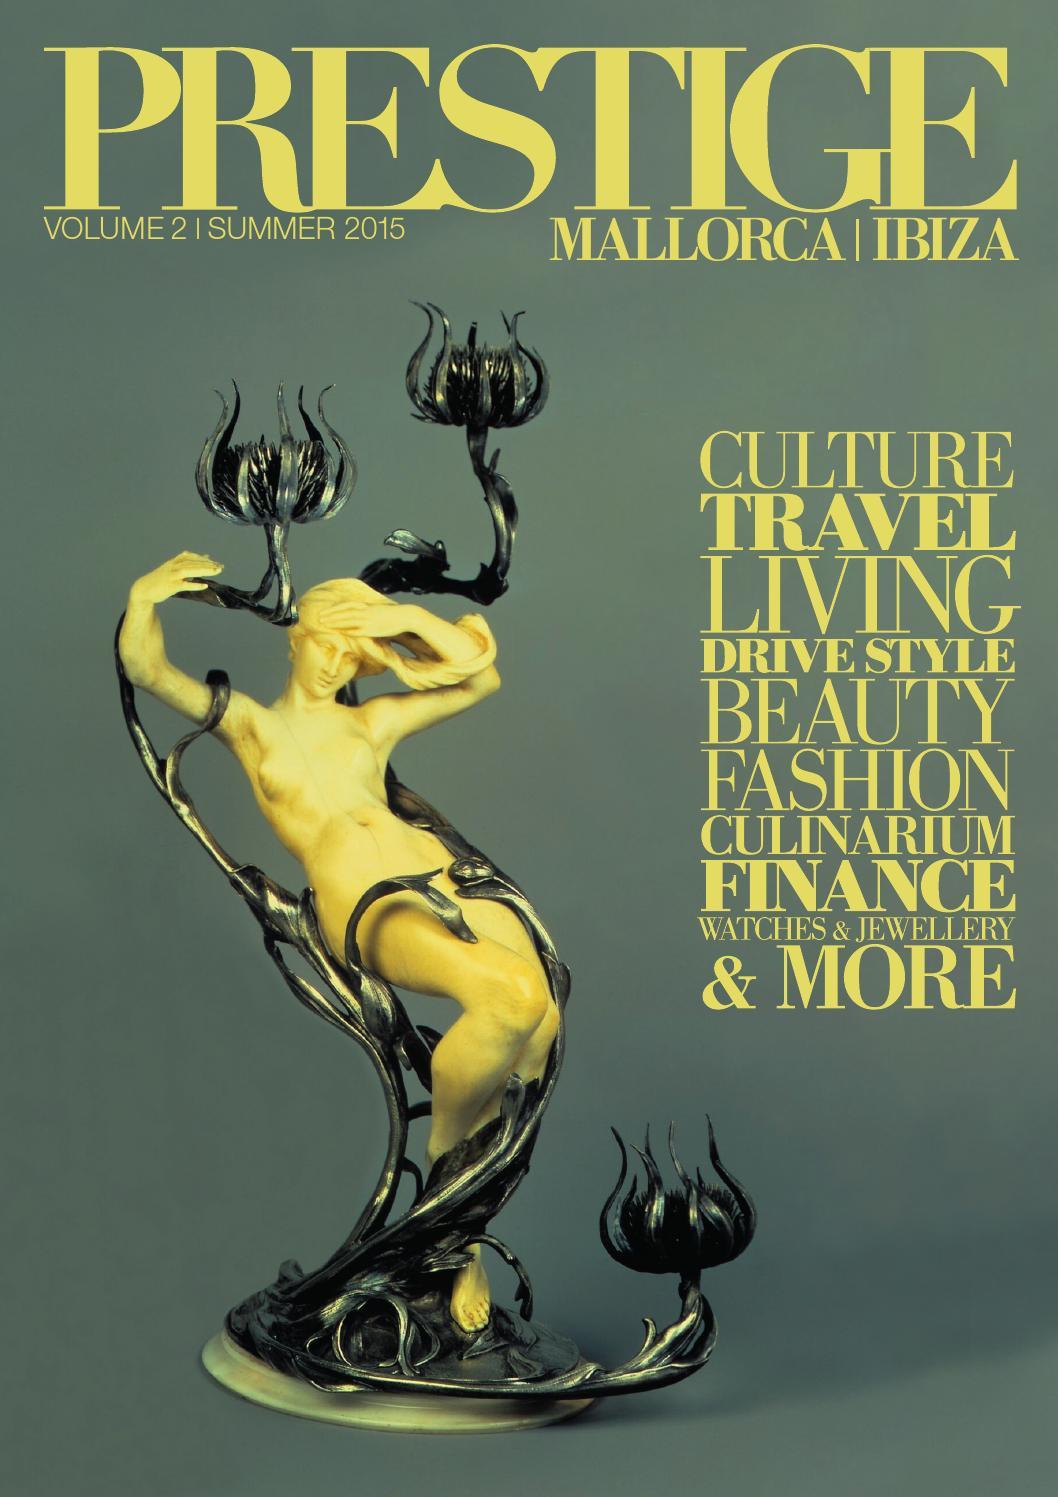 PRESTIGE Mallorca I Ibiza Voulme 2 by rundschauMEDIEN AG - issuu